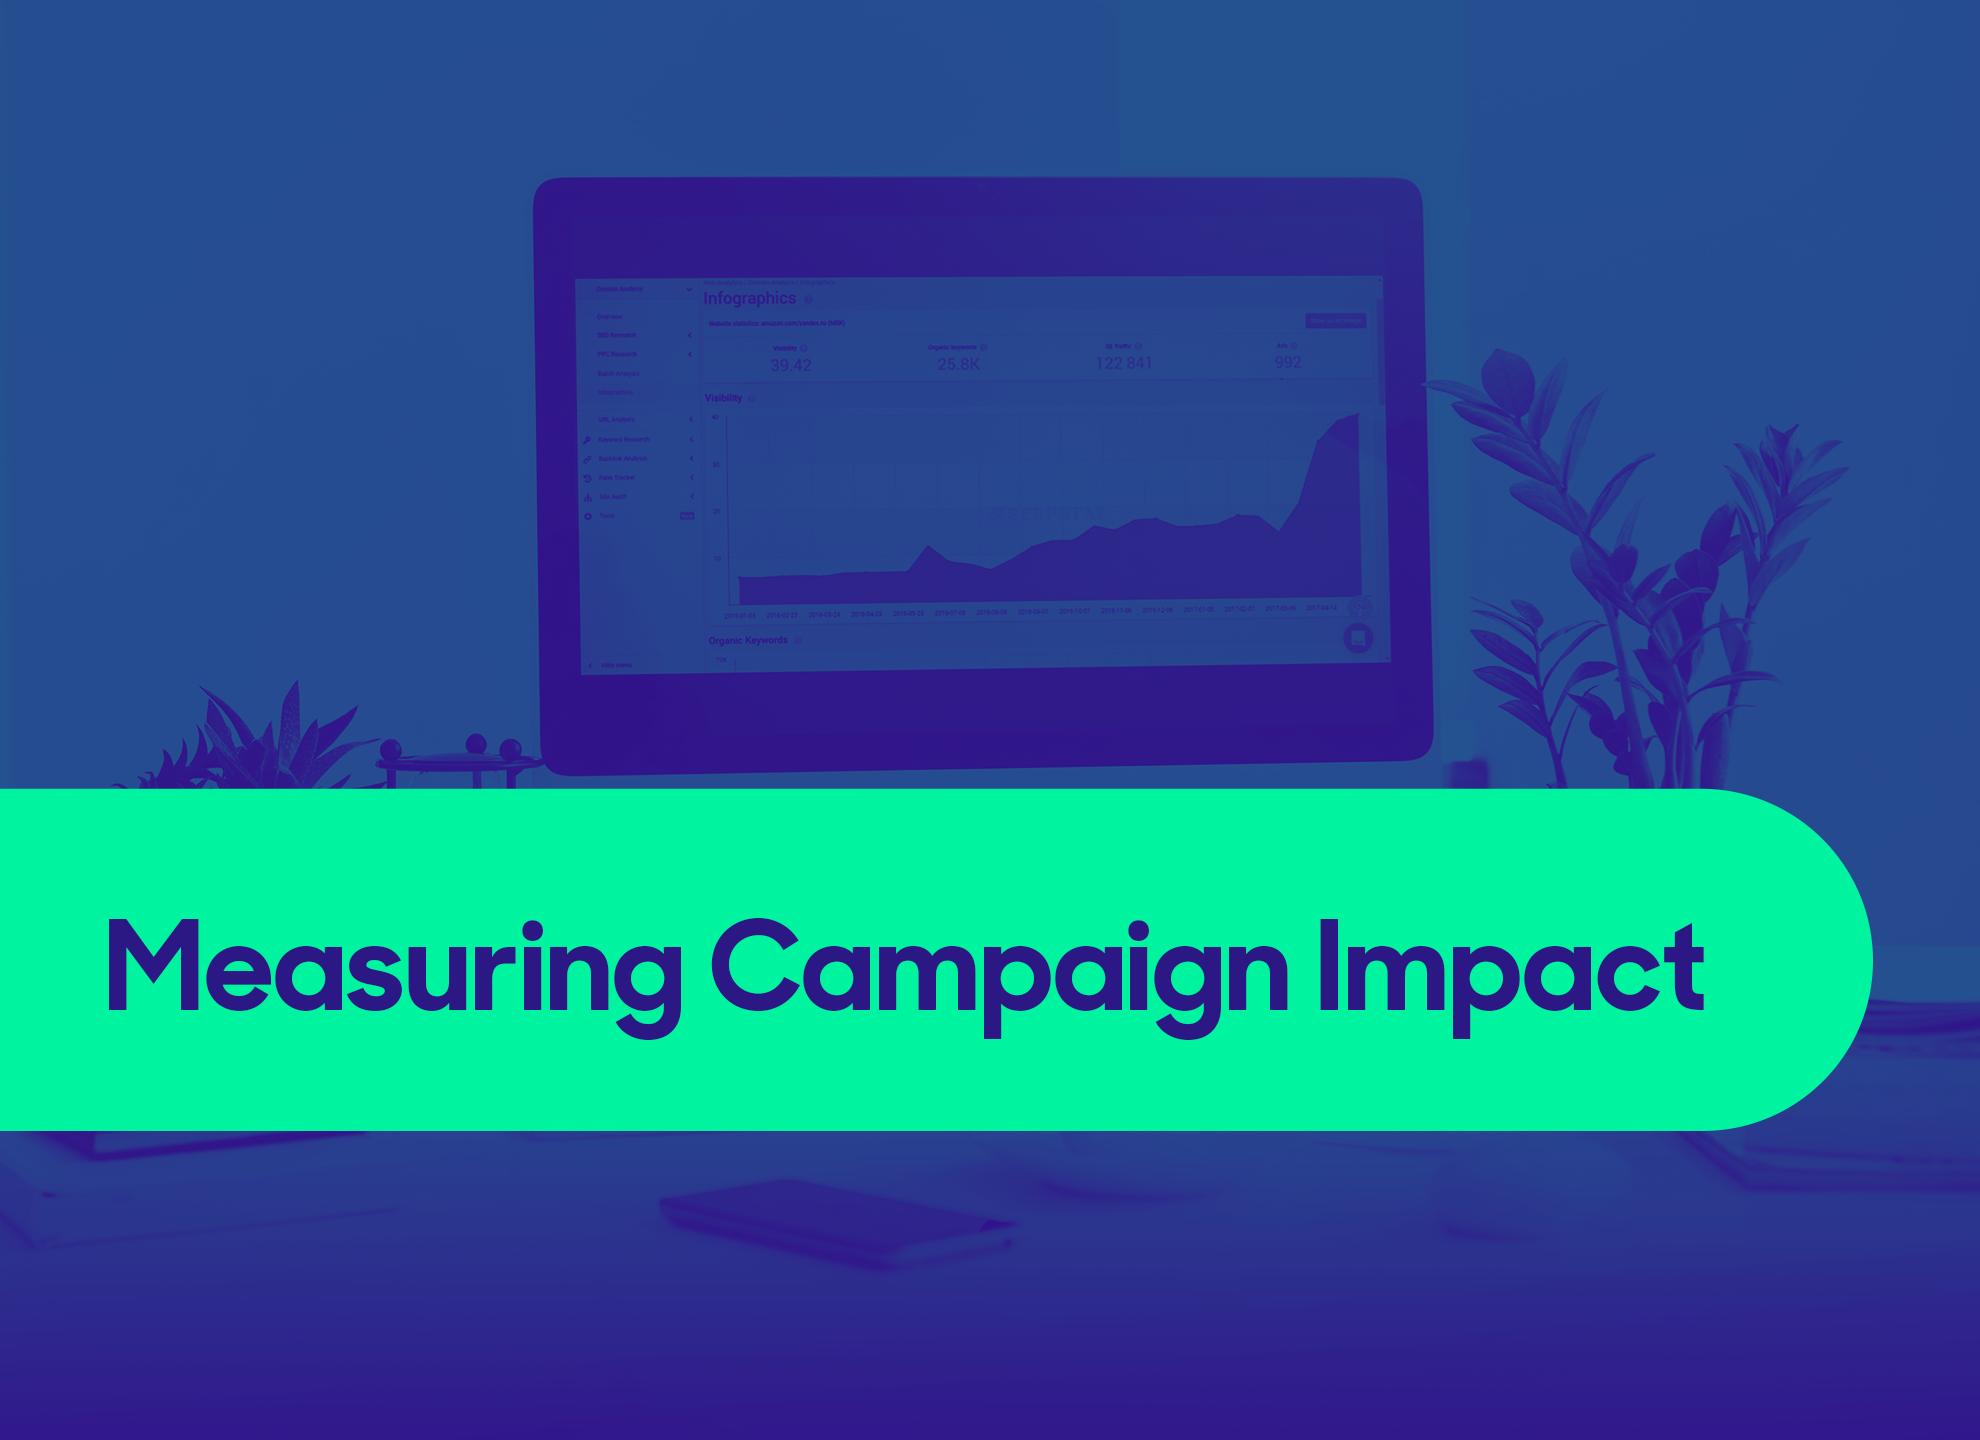 Measuring Campaign Impact Thumbnail